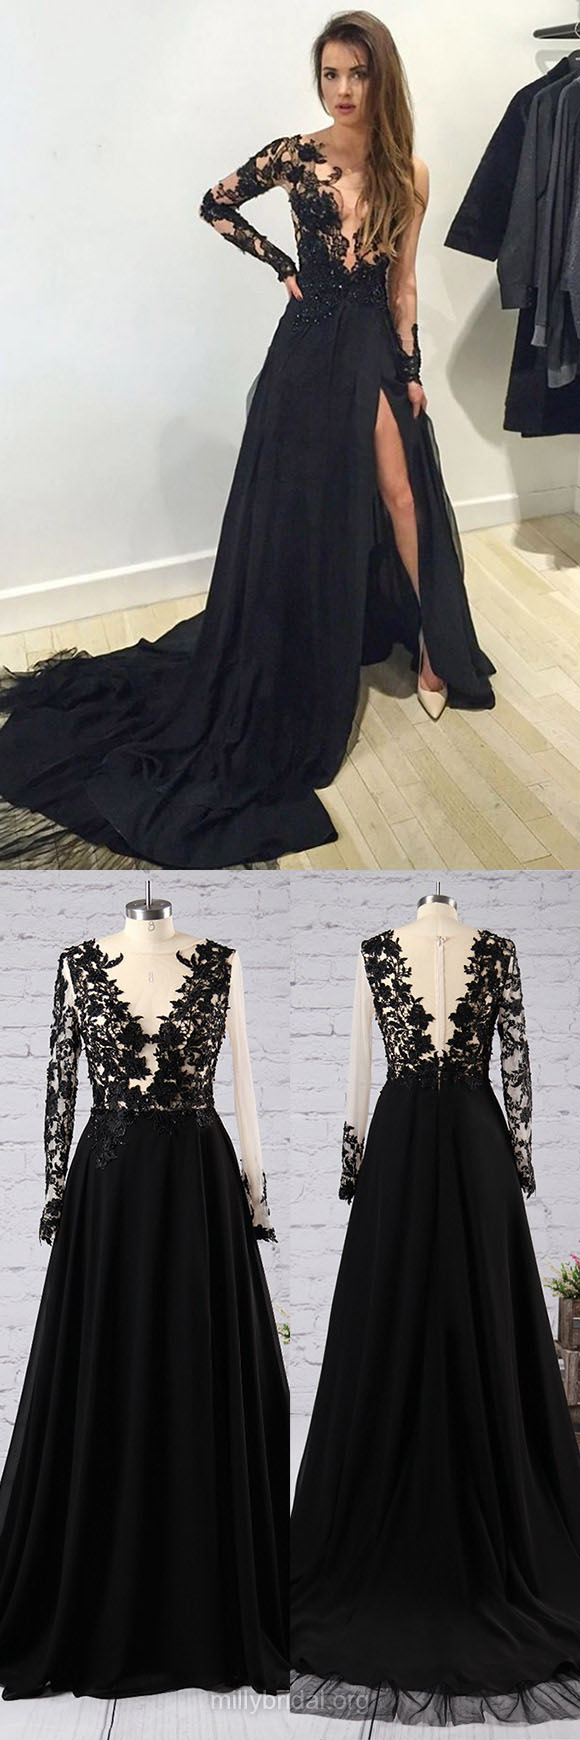 Cheap long prom dressesscoop neck tulle evening dressescourt train